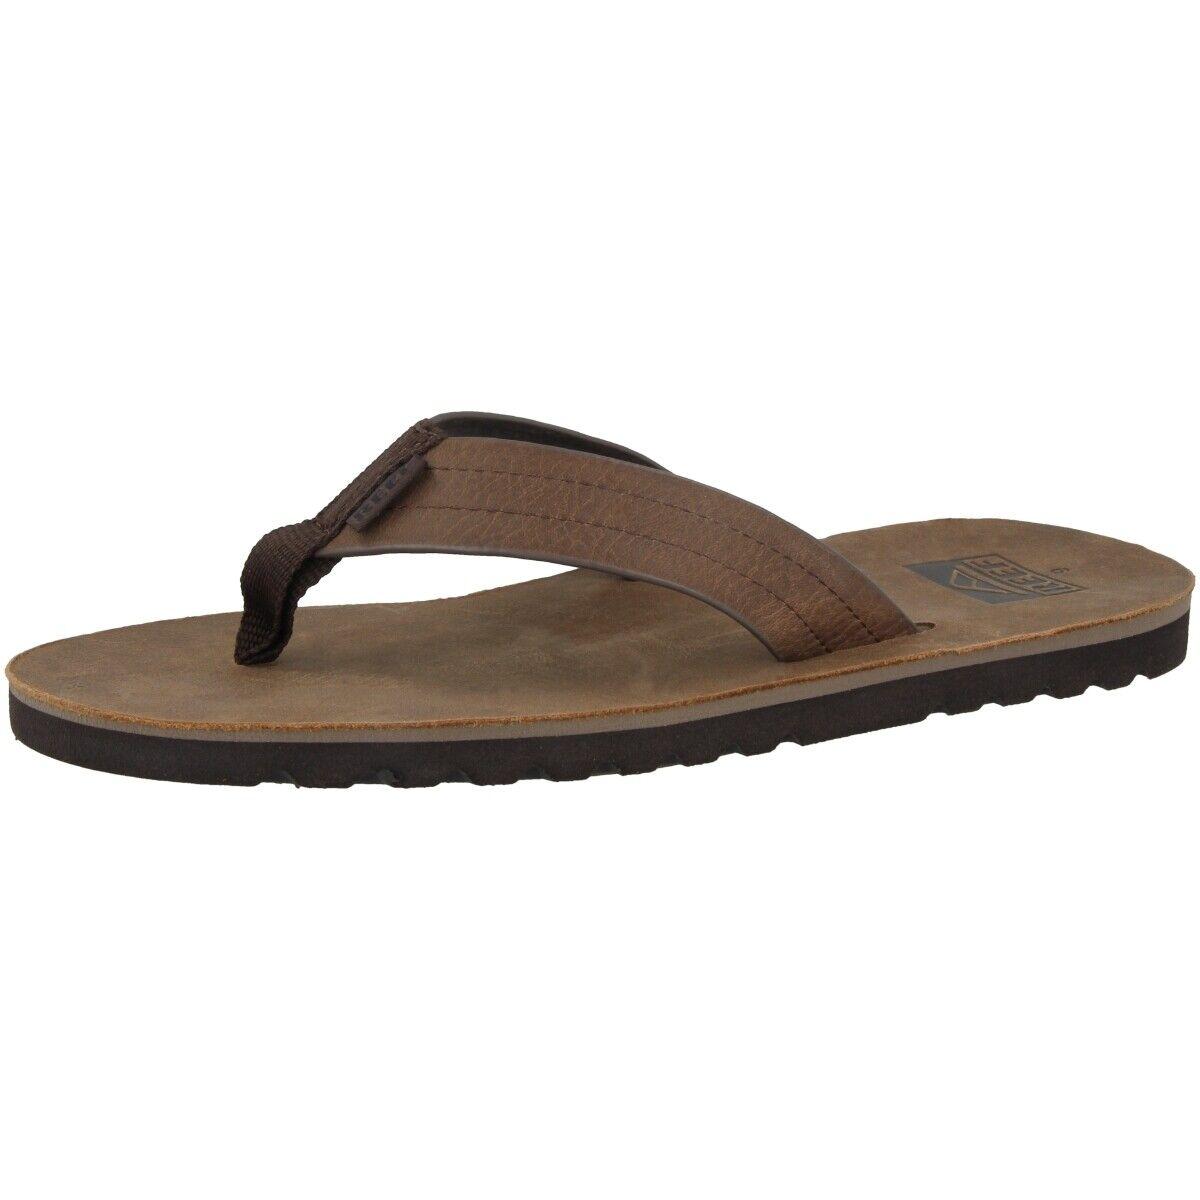 Reef  Voyage le Push -Toe Sandals Pool scarpe Slipers Marronee RF0A2YFRDAB  forma unica